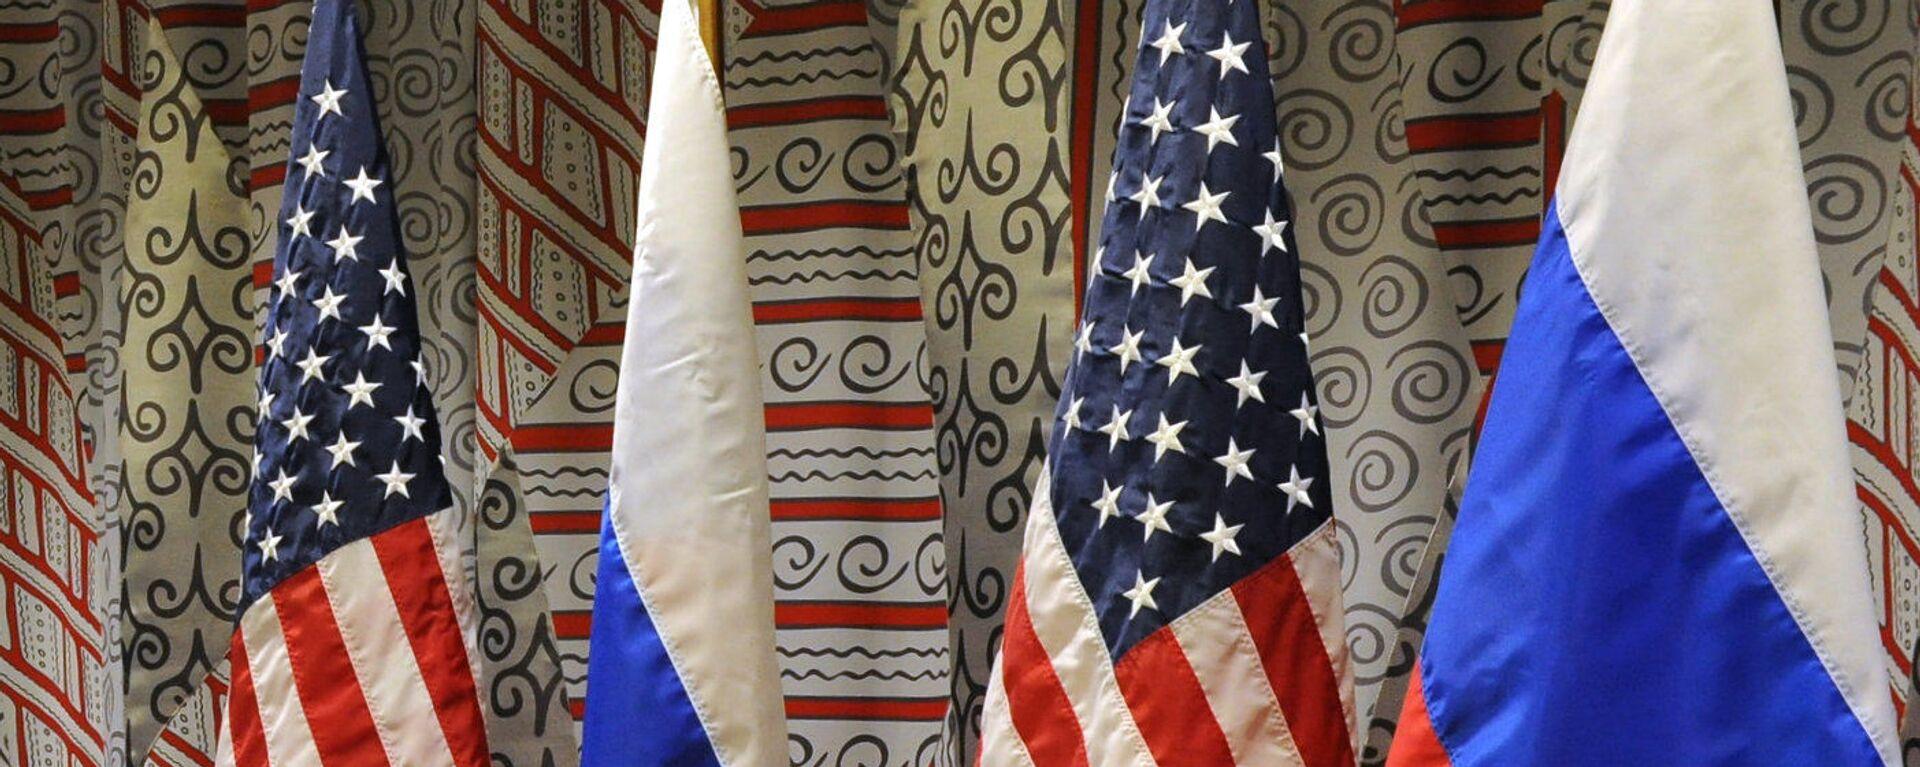 Флаги России и США - Sputnik Таджикистан, 1920, 08.02.2021